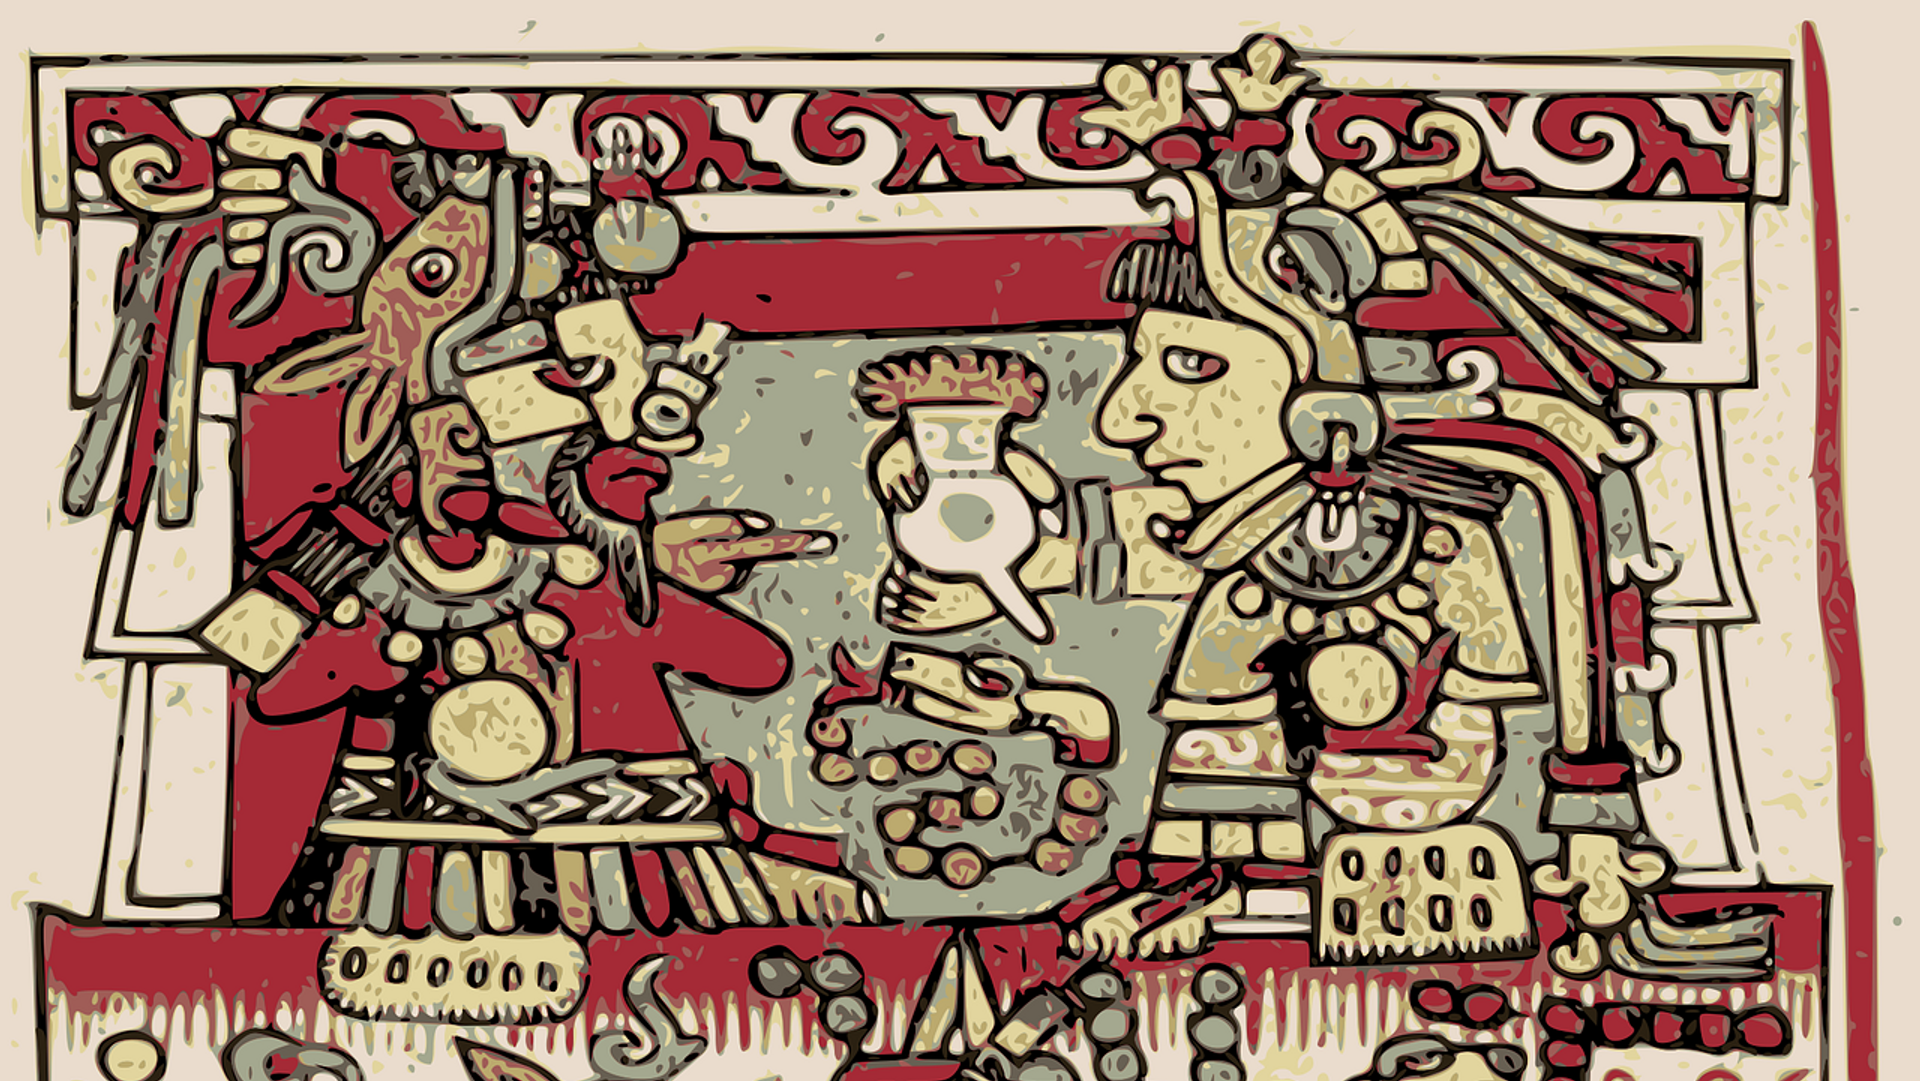 Un dibujo azteca - Sputnik Mundo, 1920, 03.02.2021